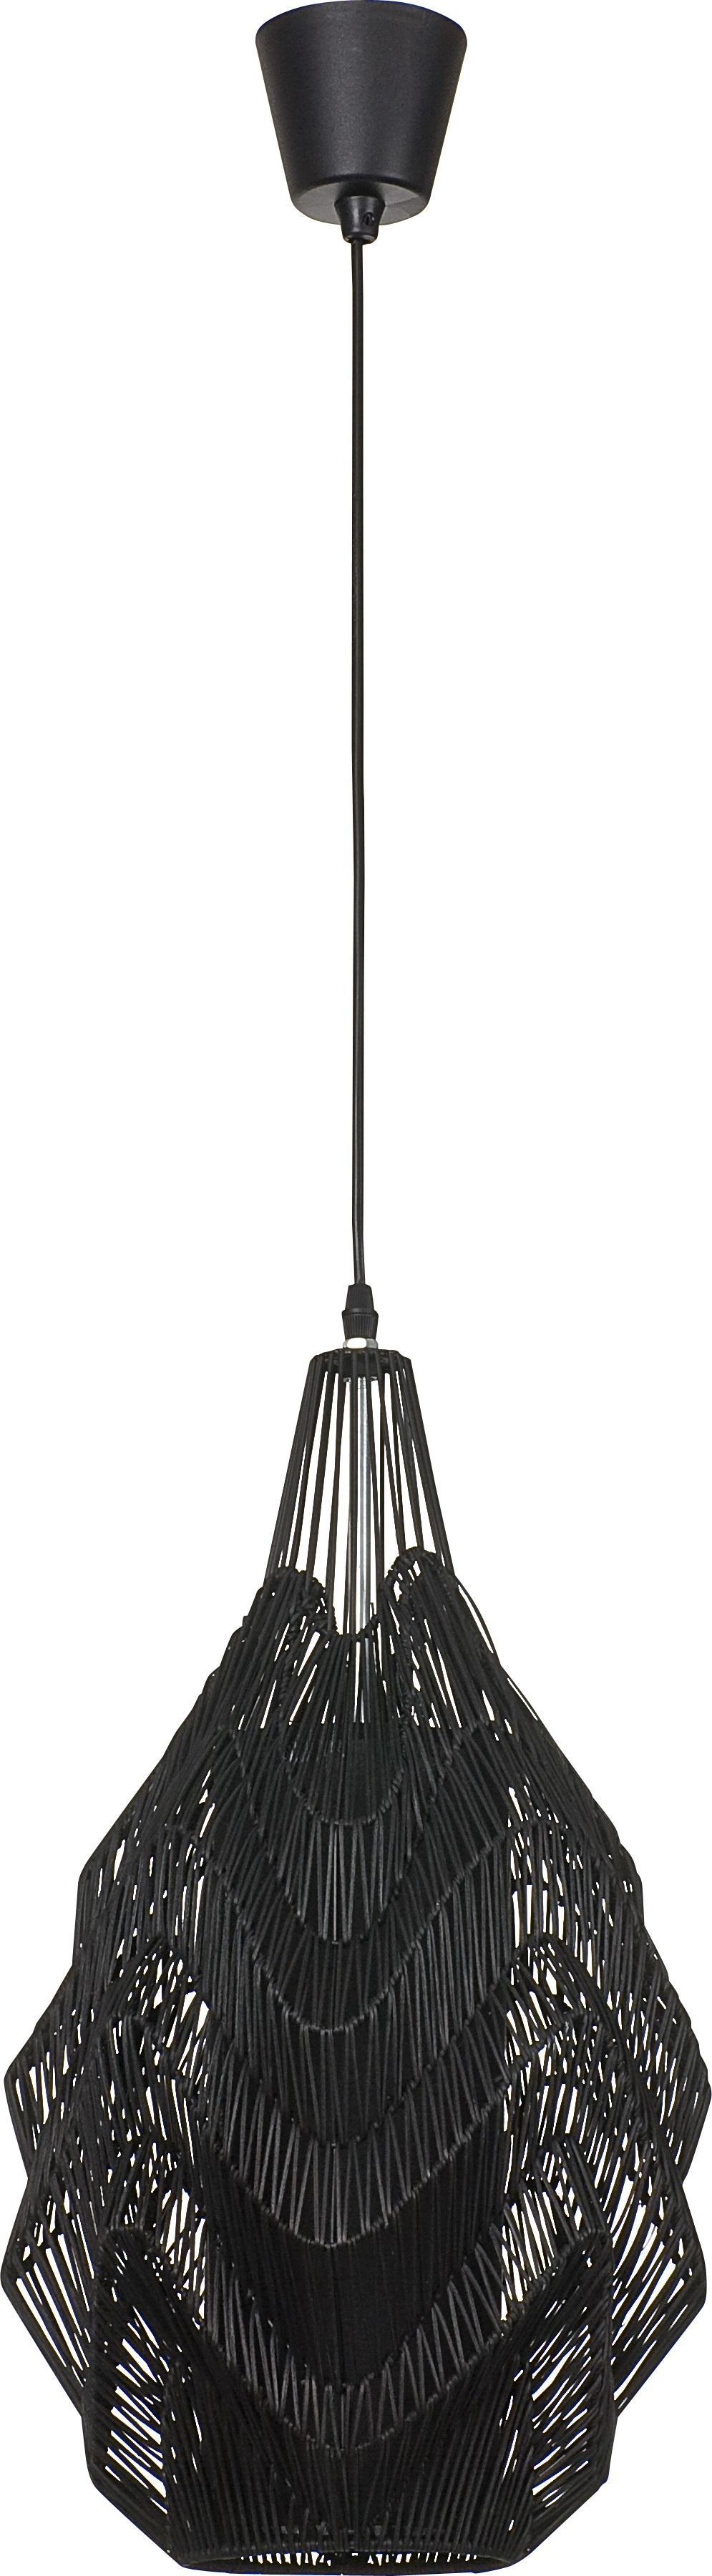 Lampy Lucan marki Nowodvorski Lighting